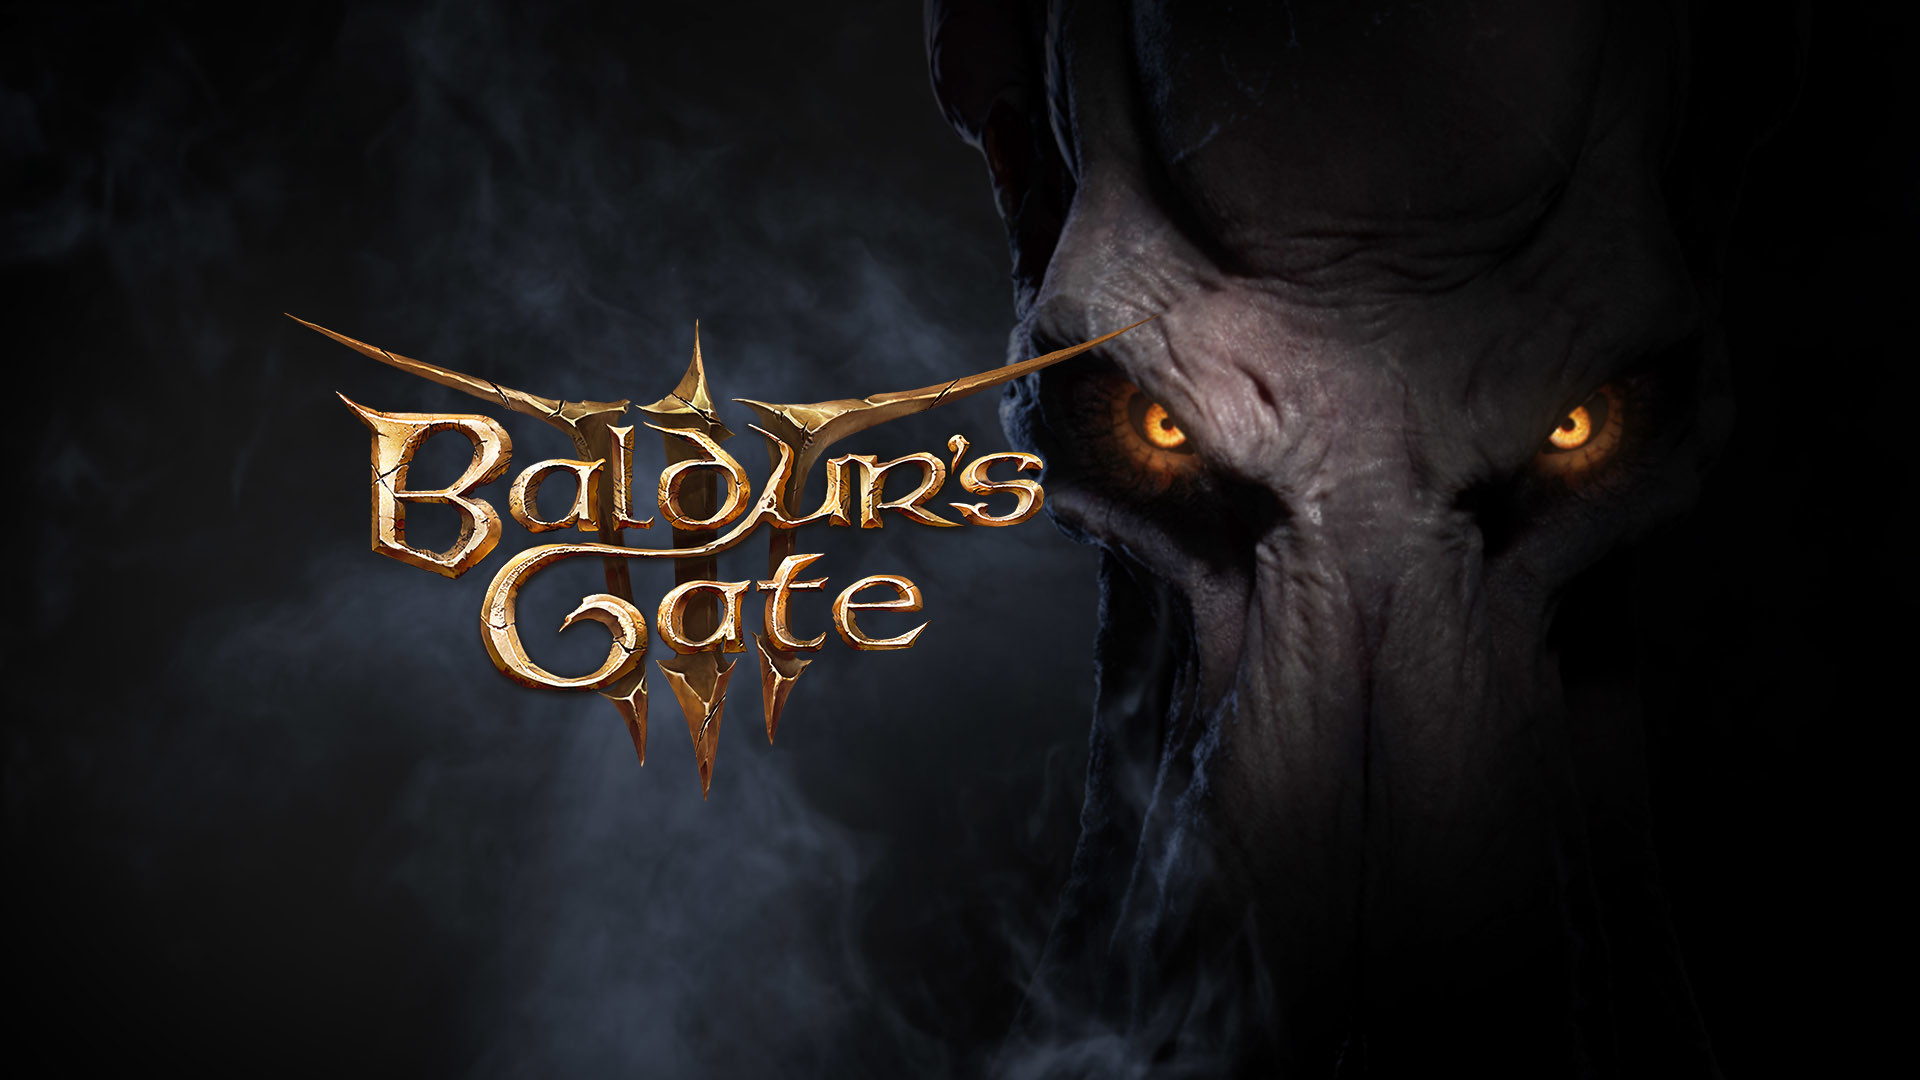 Baldur's Gate 3 - oficjalny gameplay już za kilka dni! 26